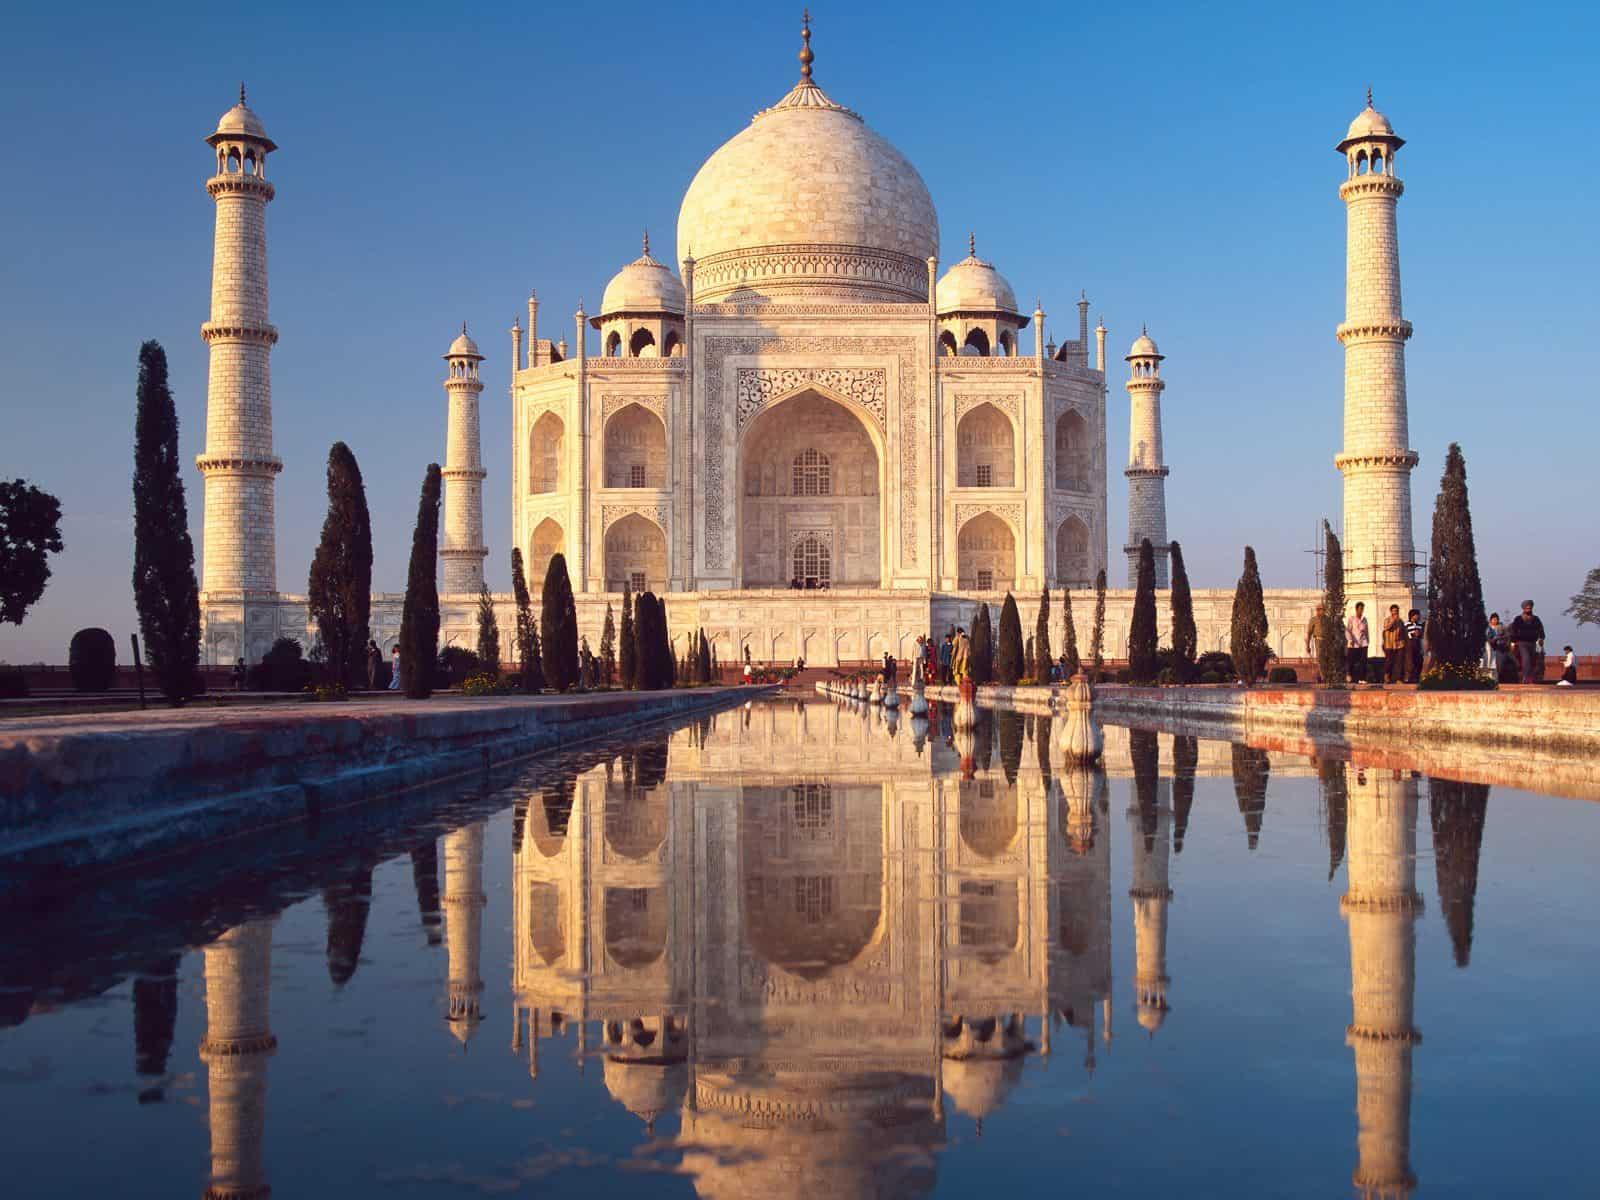 Exclusive-Escapes-Goa-India-Taj-Mahal-India-Map-Trip-To-India-Bangalore-India-Travel-To-India-Luxury-Travel-Magazine-Beverly-Hills-Magazine-1